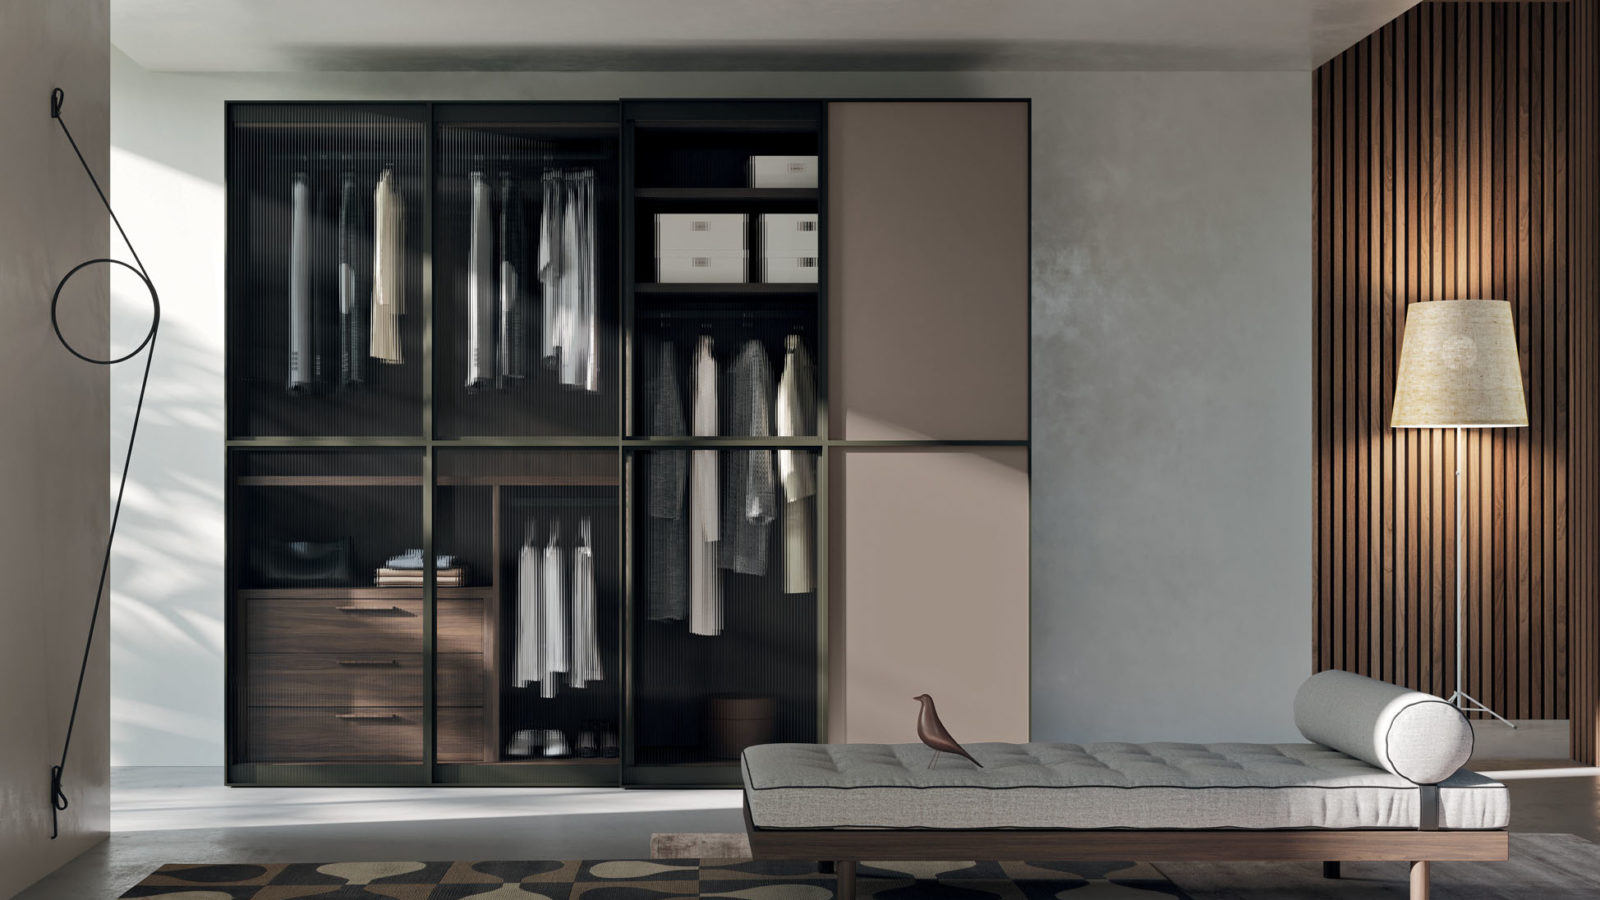 armadio-scorrevole-anta-cubi-glass-0-orme-1600x900-1